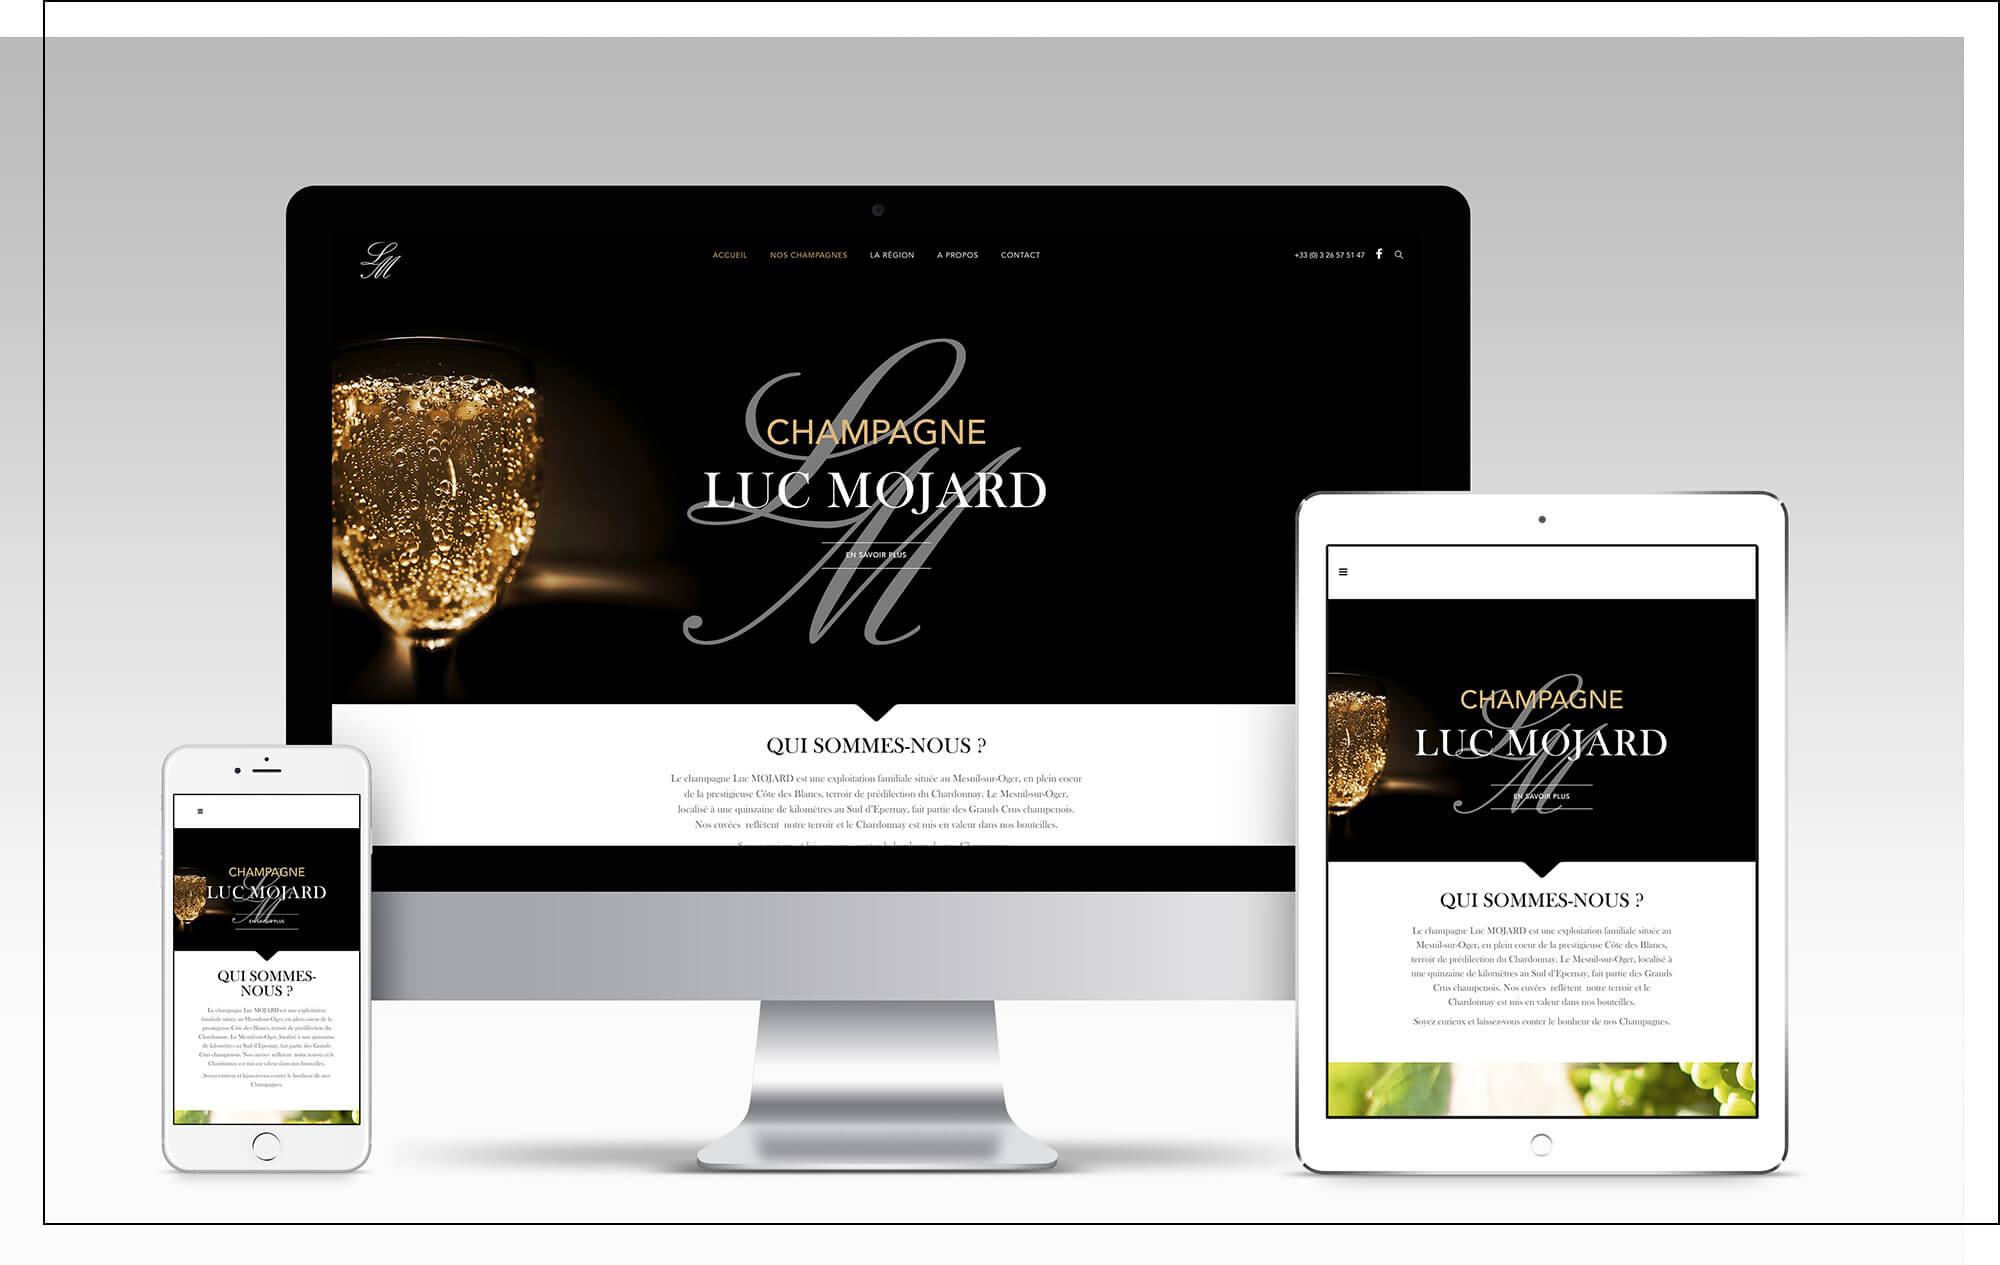 Champagne Luc Mojard 2